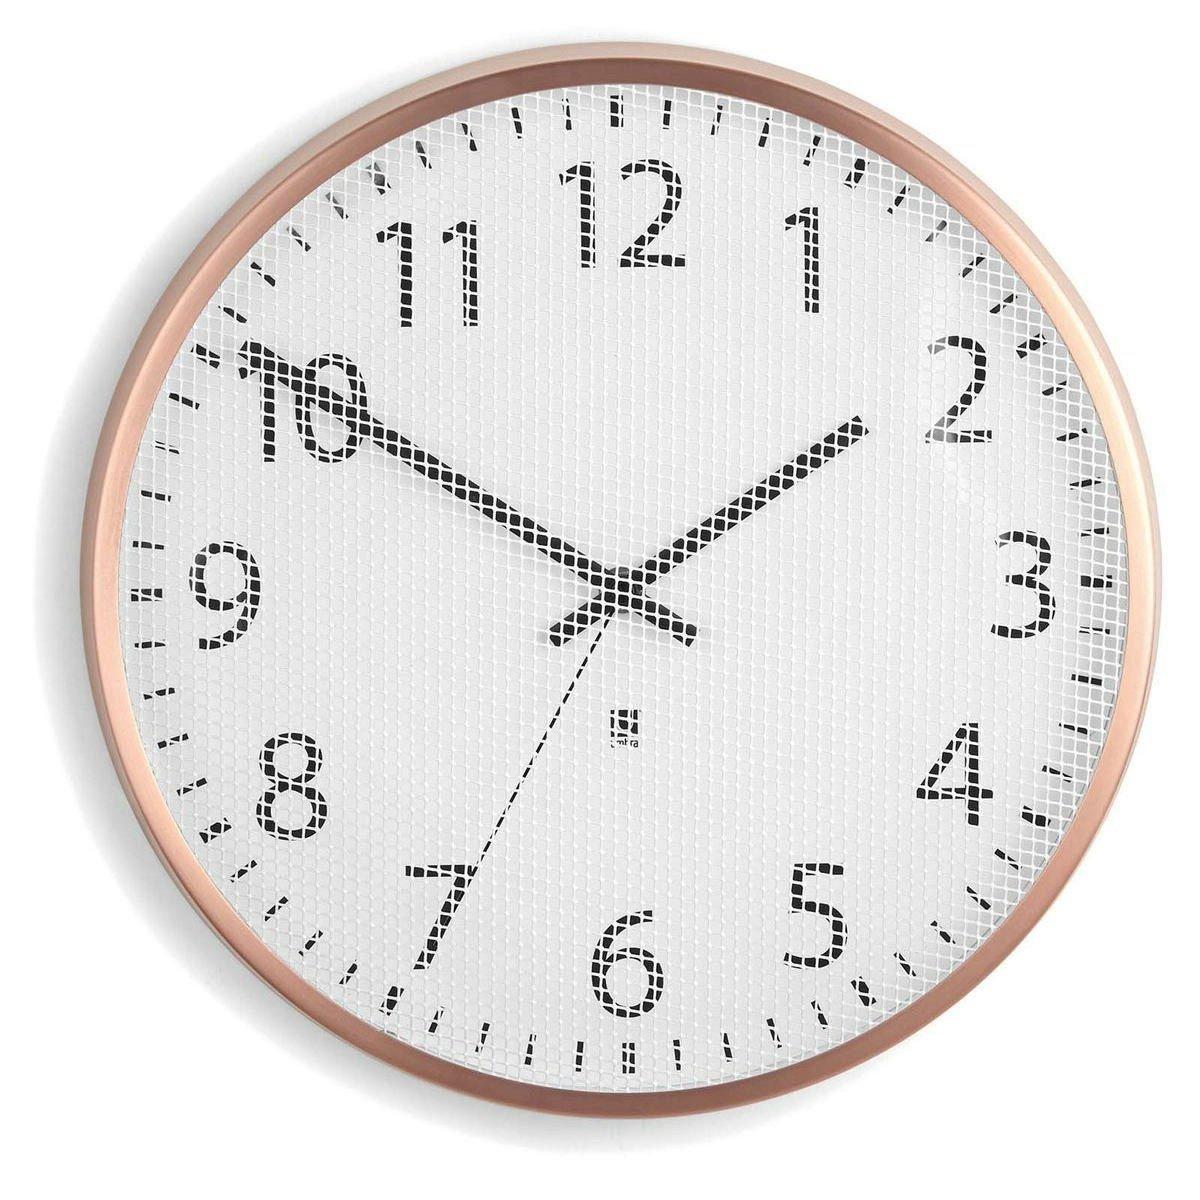 Perftime Clock image